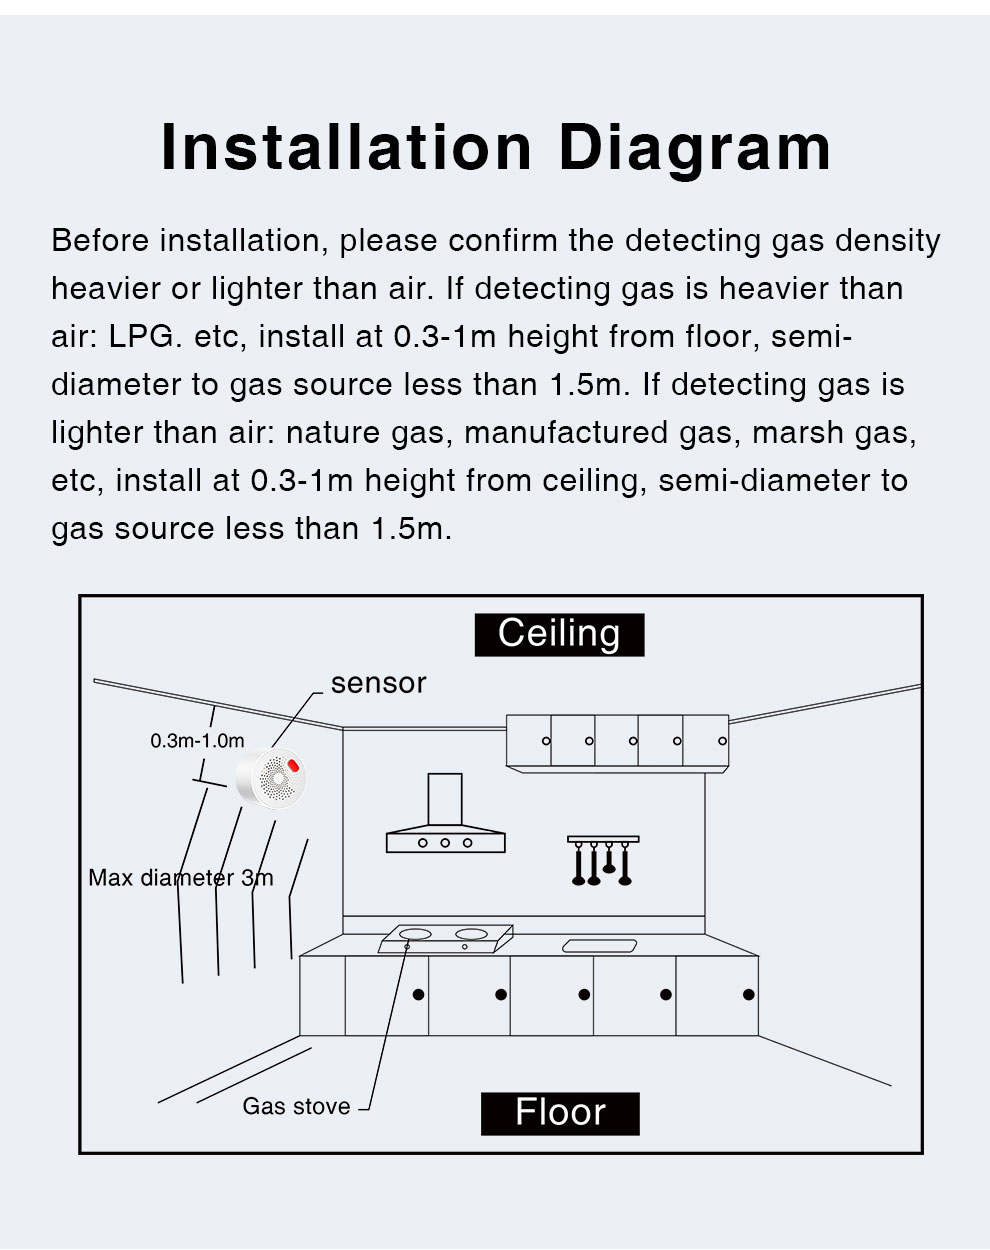 Enerna IoTech WiFi smart gas leakage alarm sensor prevention of flammable gas leakage hazards